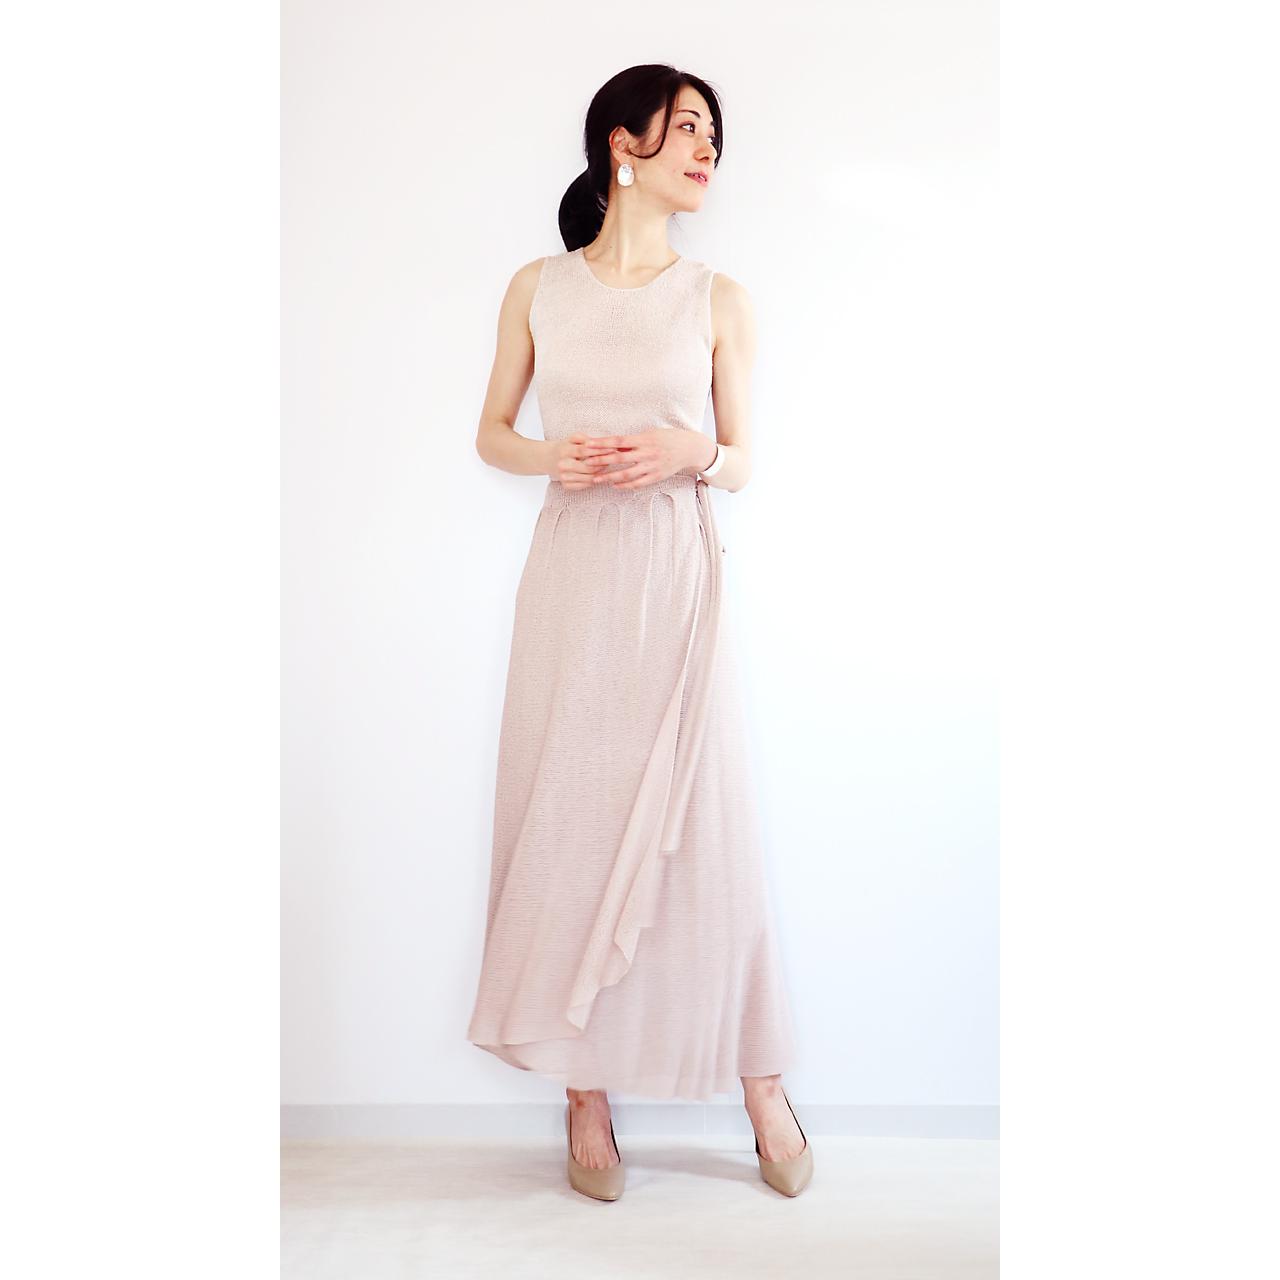 Diphda[ディフダ] マキシ丈ラップ・スカート / ヌード・ベージュ